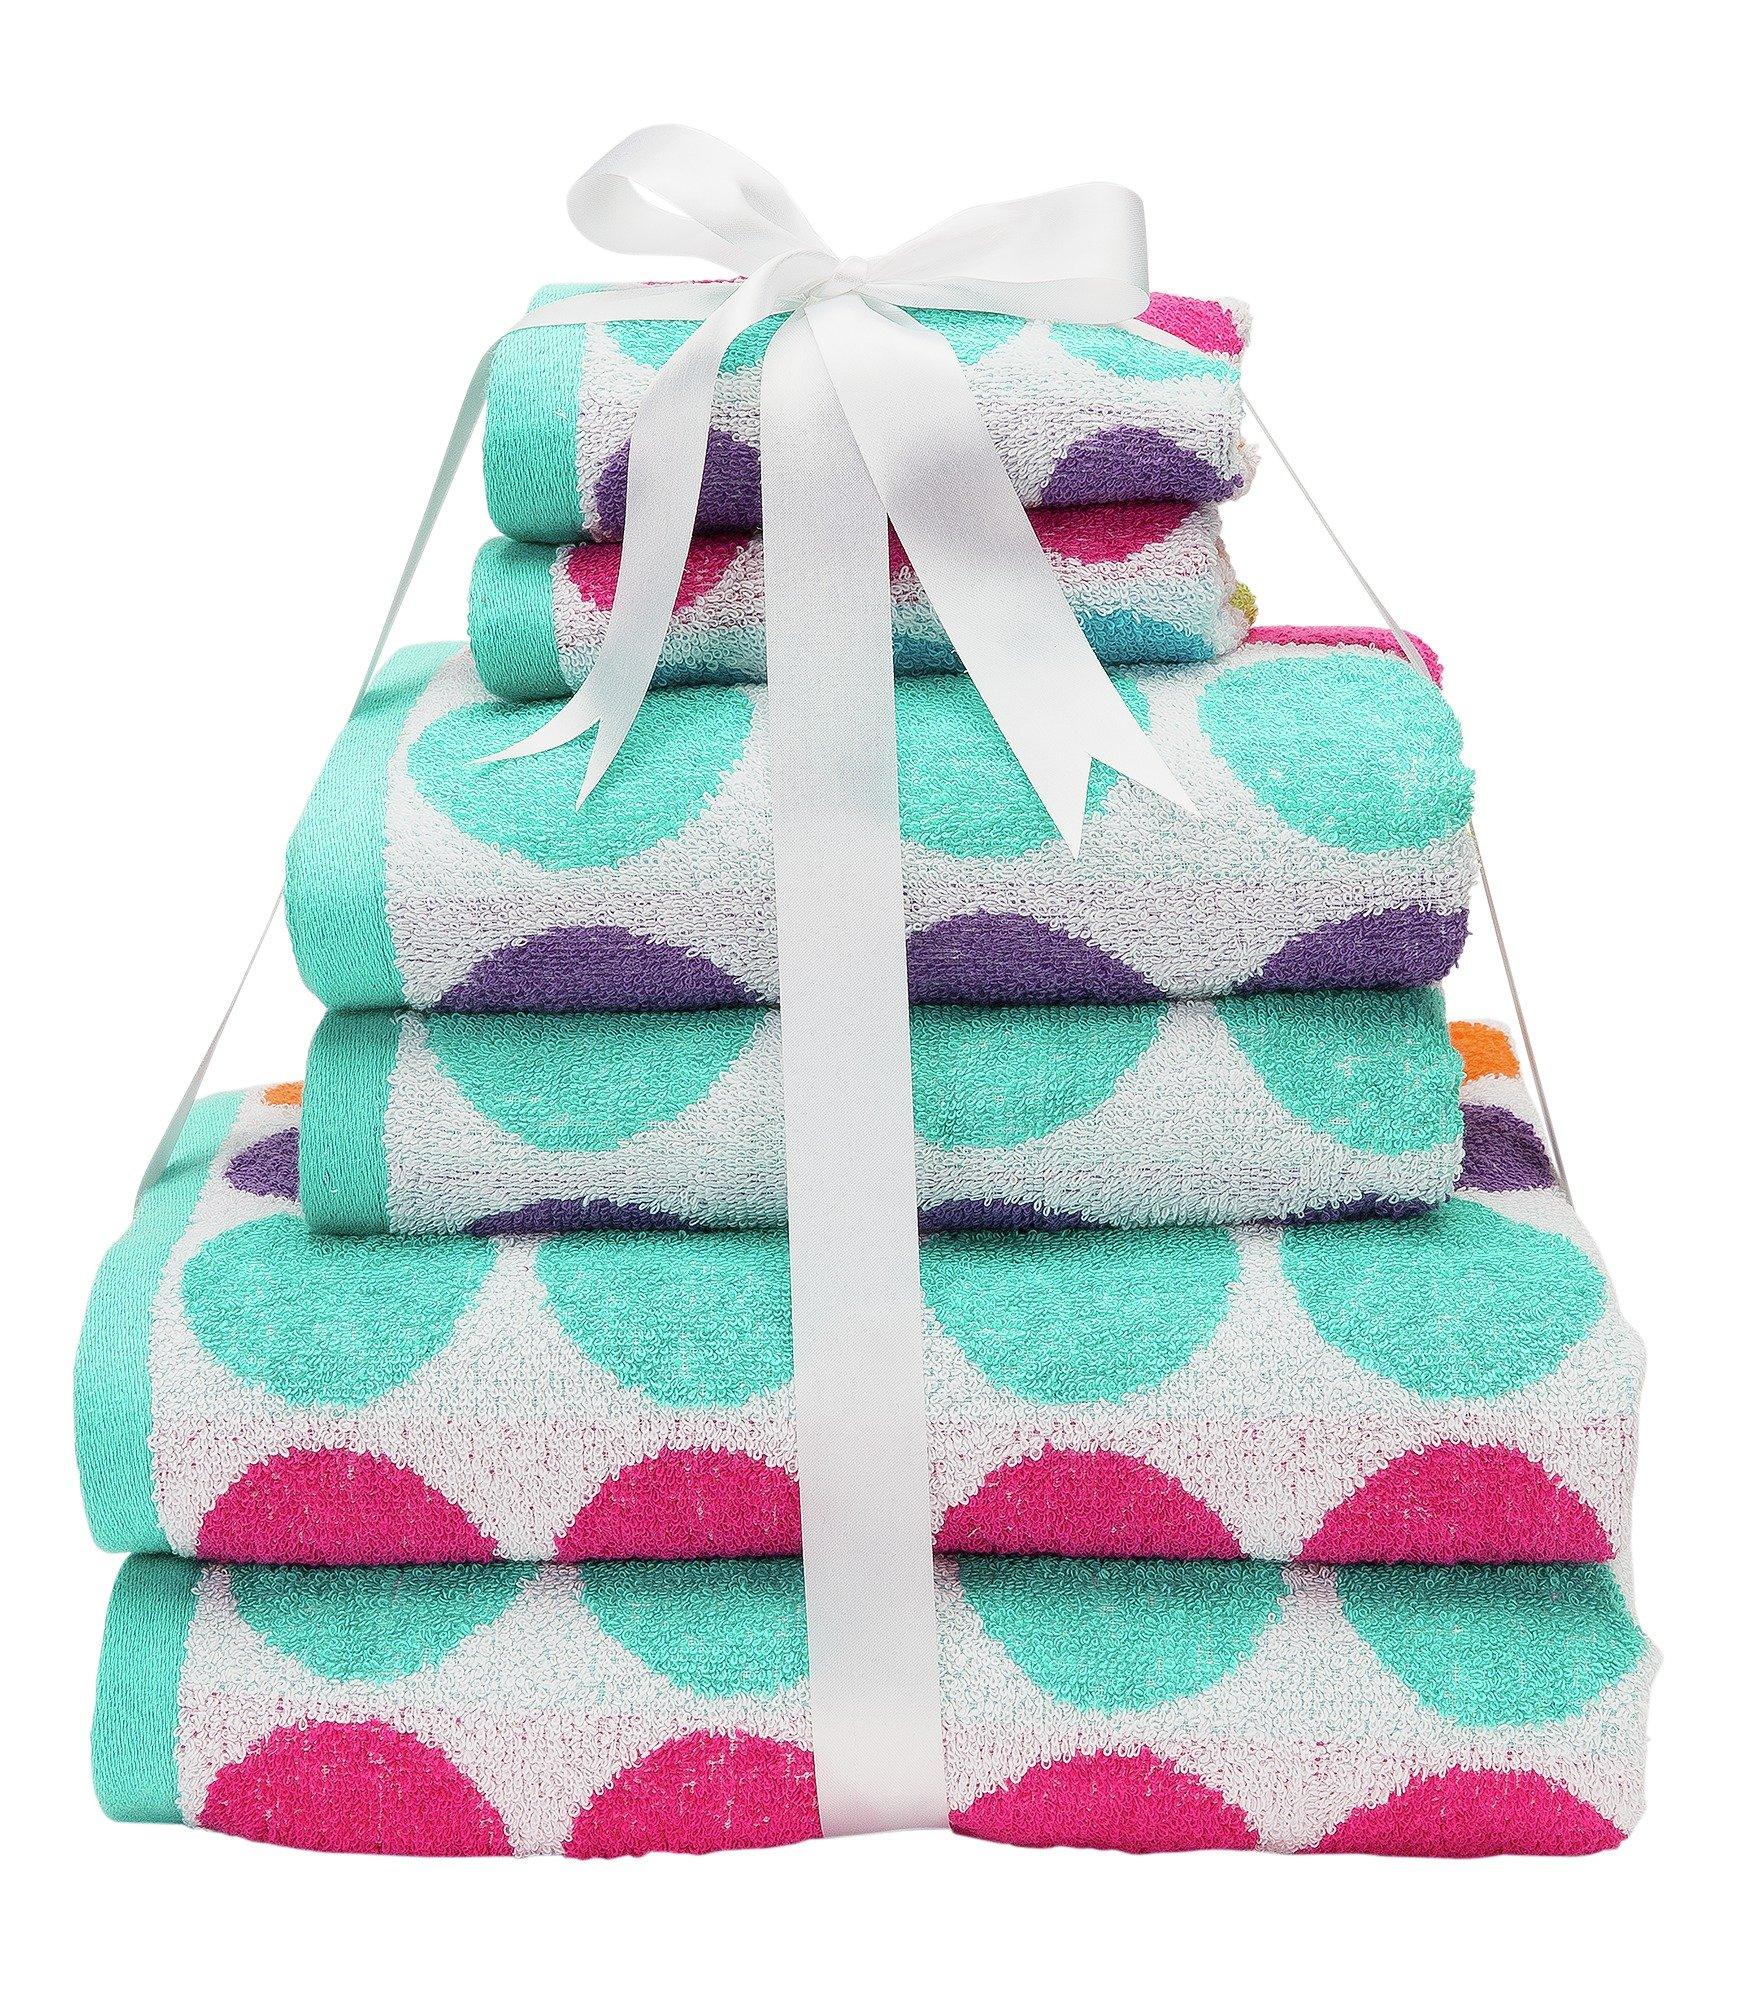 Argos Home 6 Piece Towel Bale - Spots